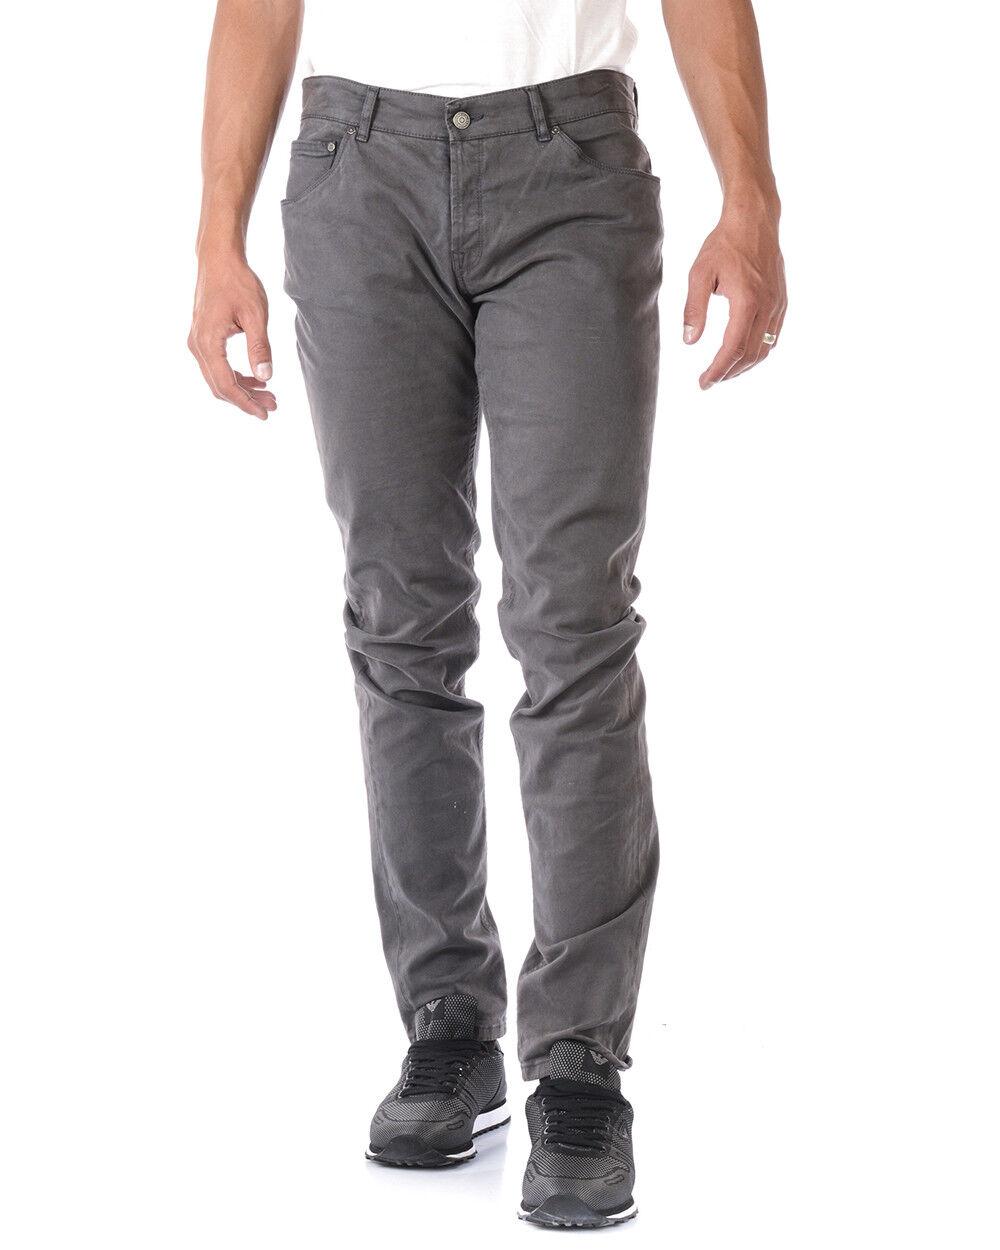 Jeans Daniele Alessandrini Jeans Cotone men grey PJ4610L1003435 10